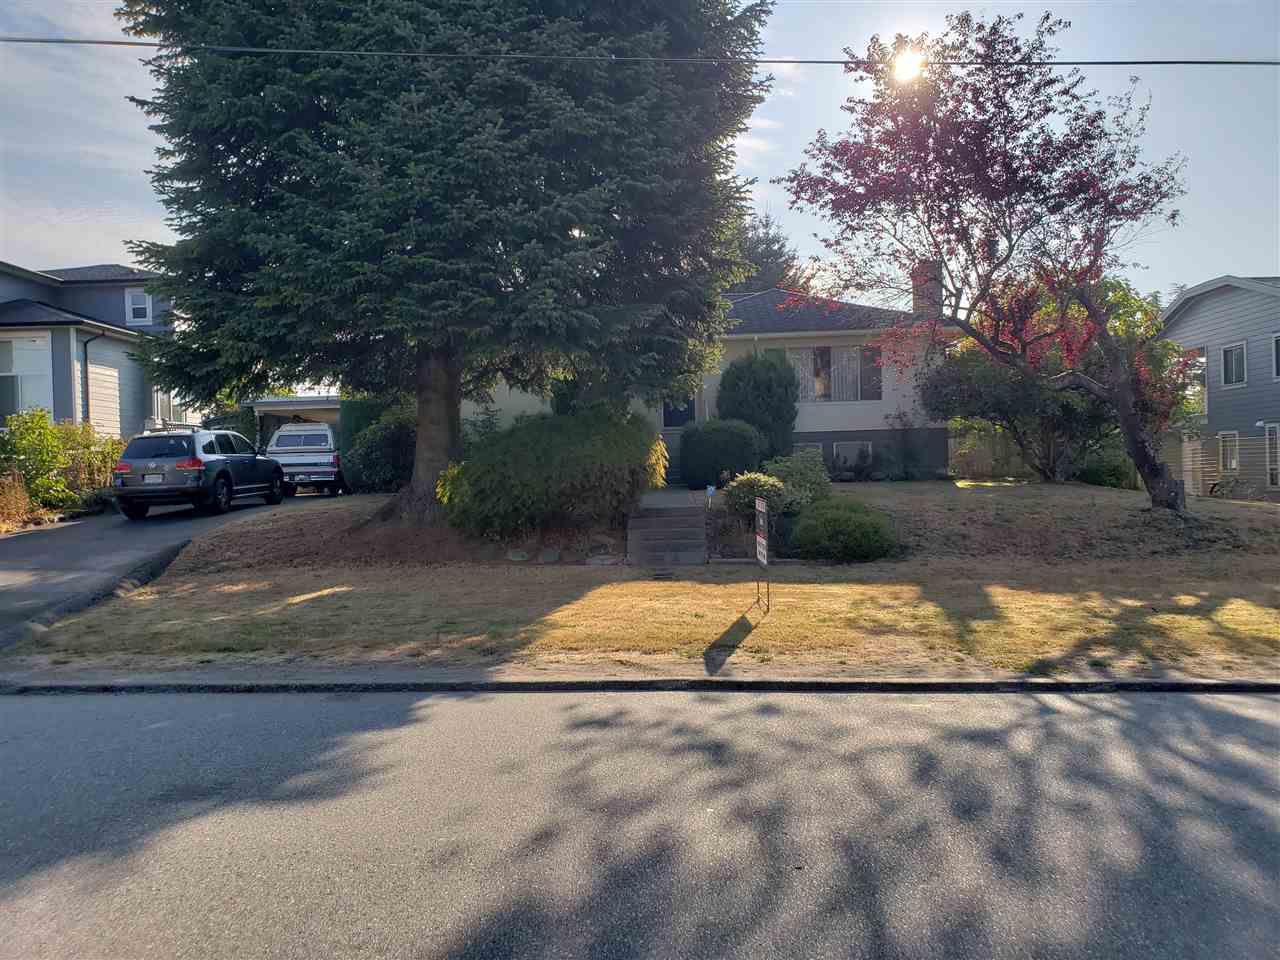 Main Photo: 4336 CARLETON Avenue in Burnaby: Burnaby Hospital House for sale (Burnaby South)  : MLS®# R2305007